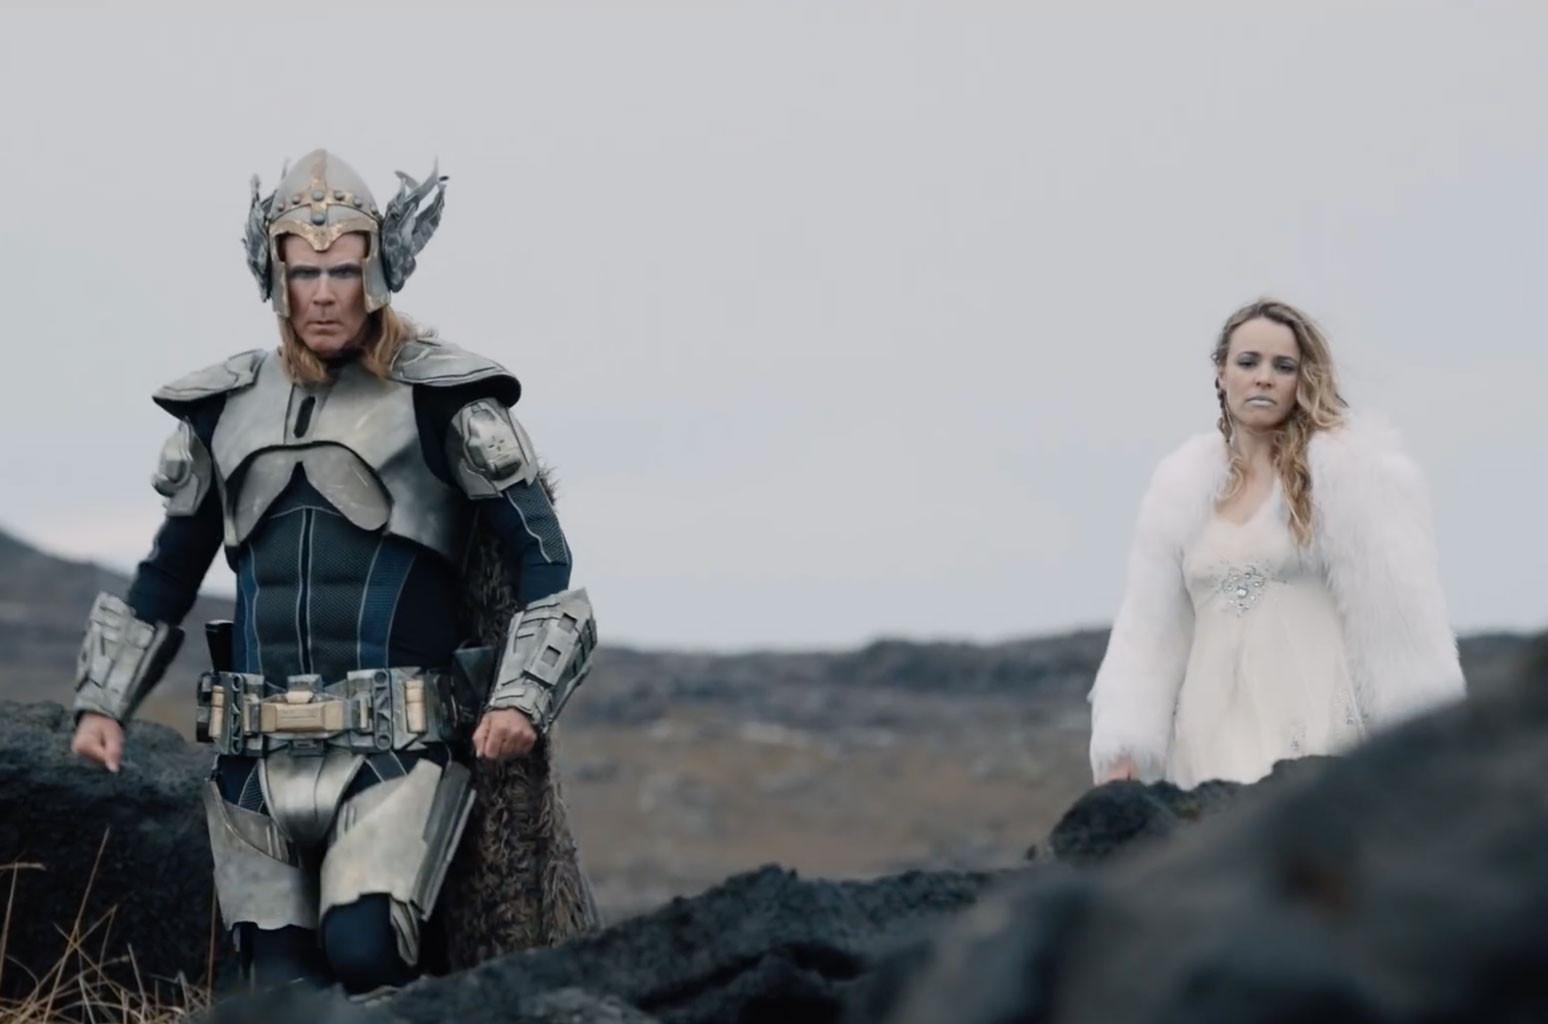 Will Ferrell and Rachel McAdams